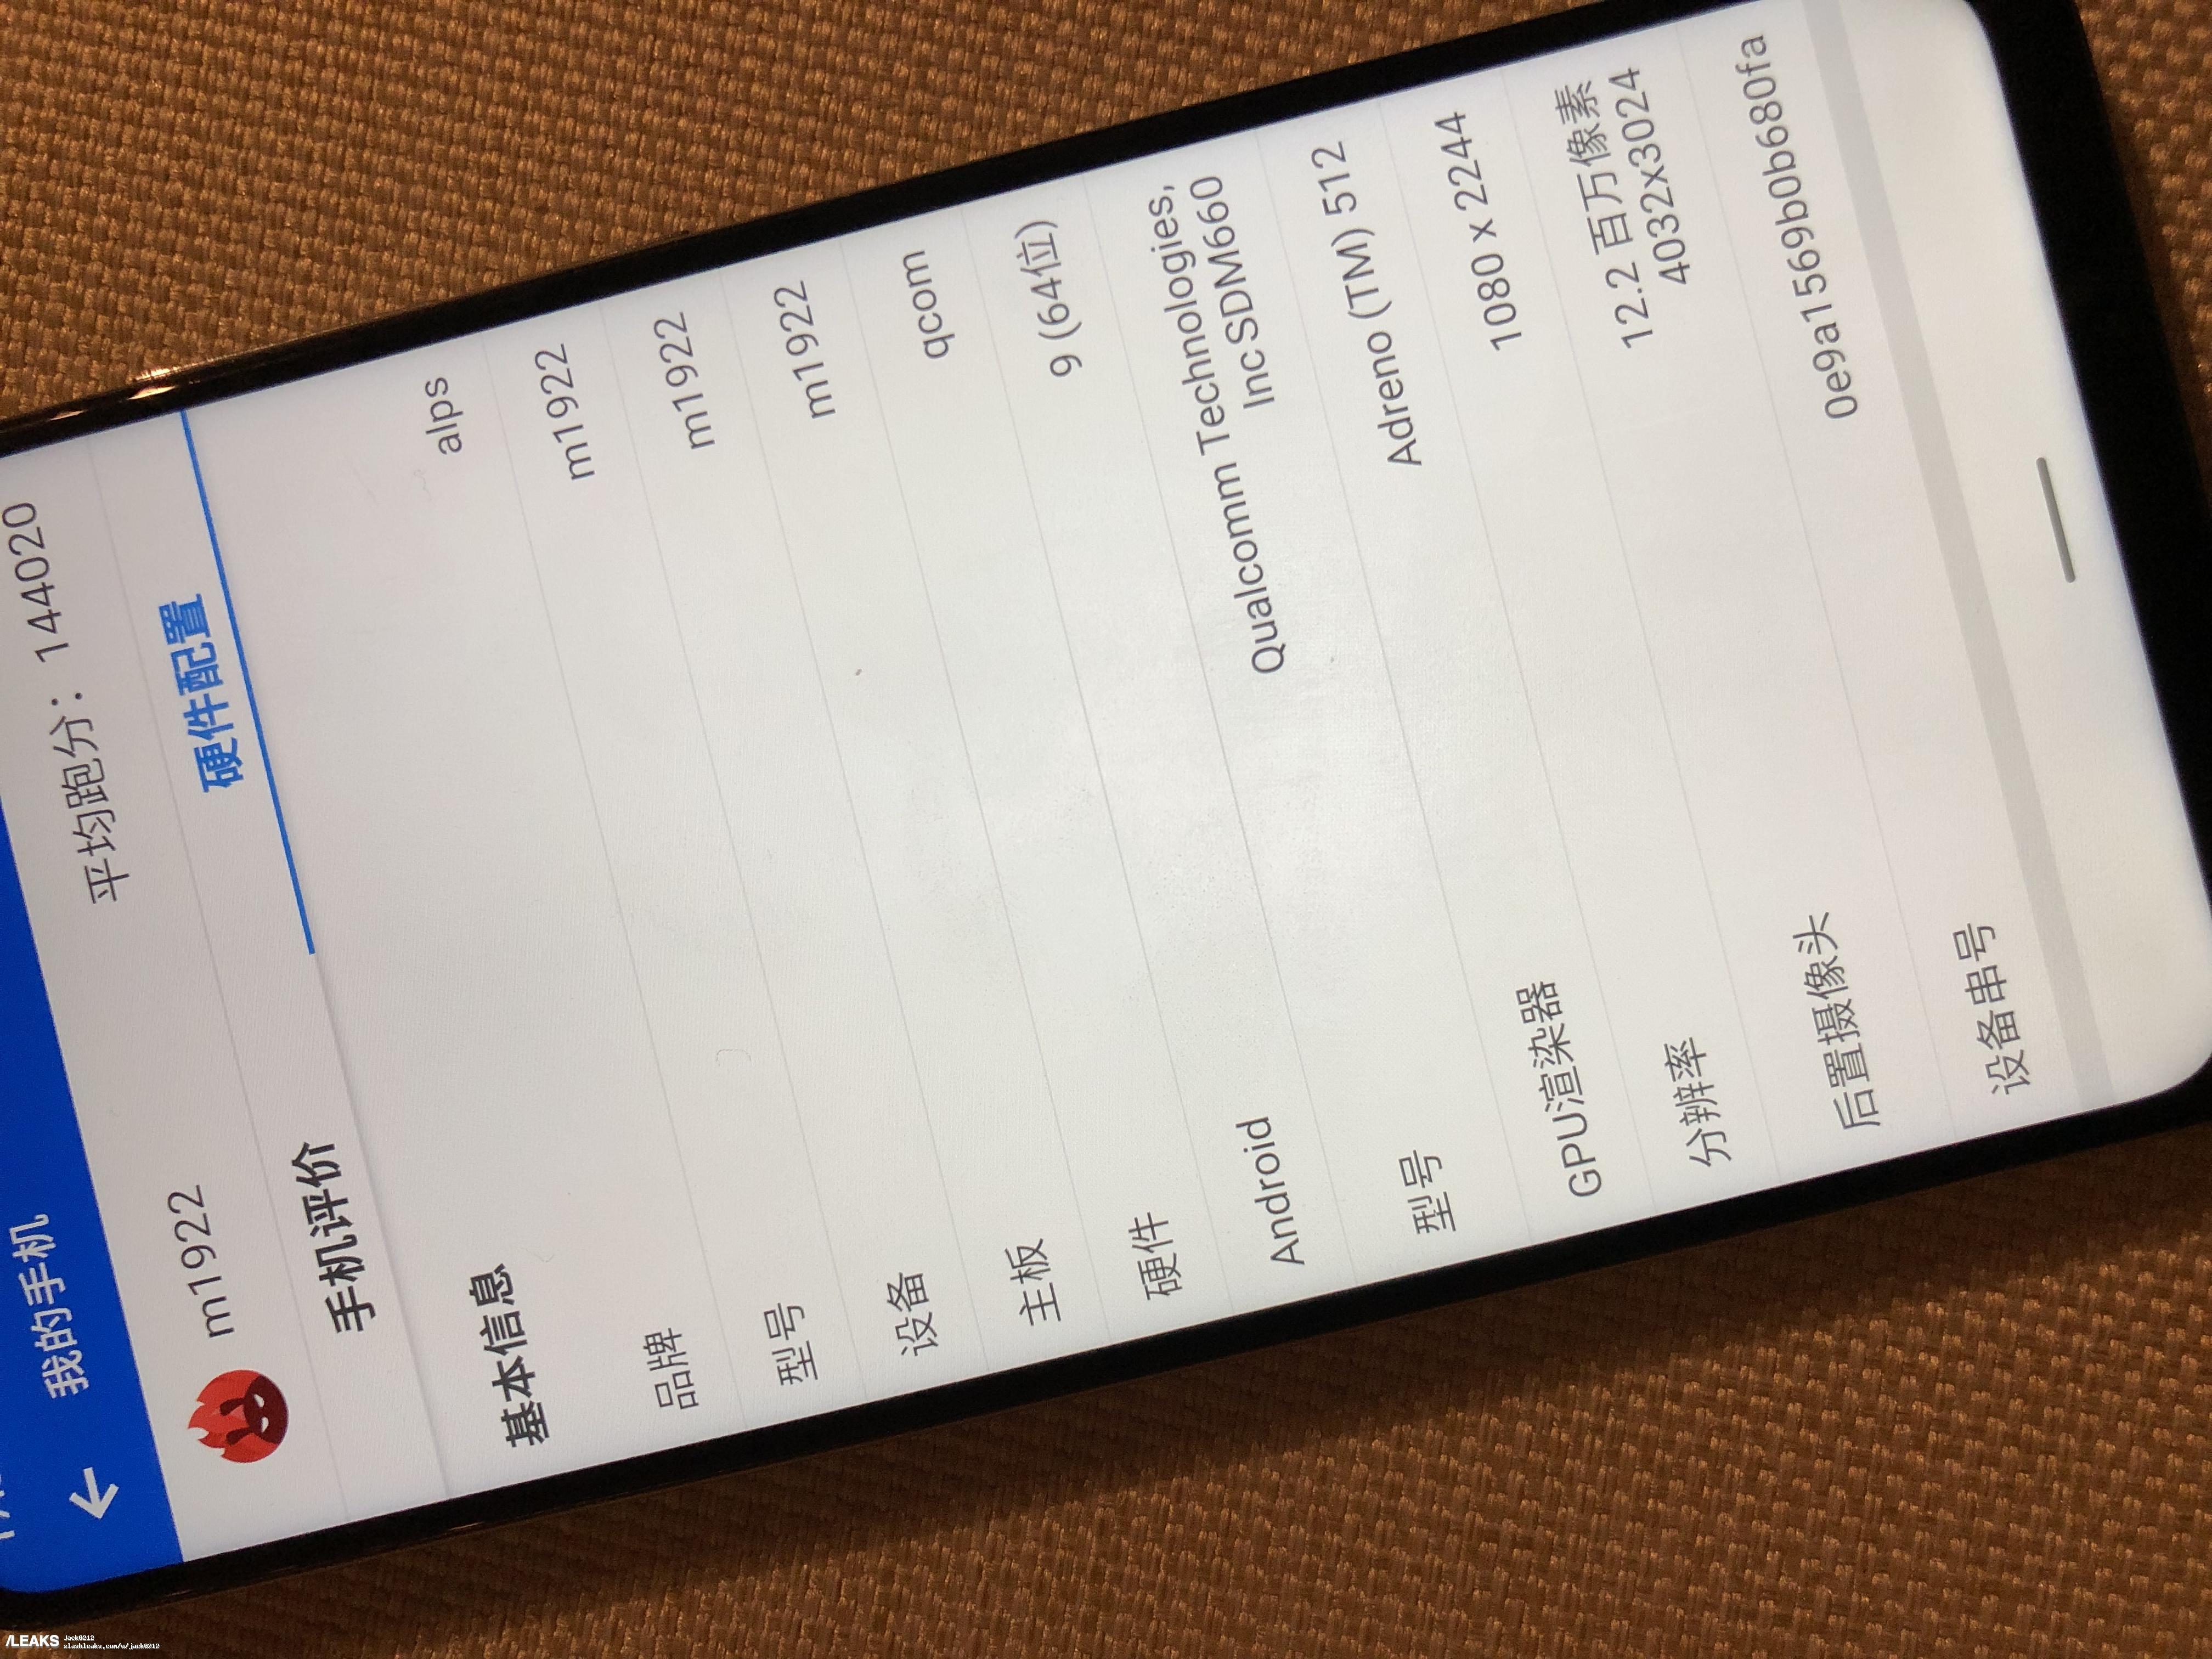 img MEIZU Note9 lite (M1823) SDM660 leaked